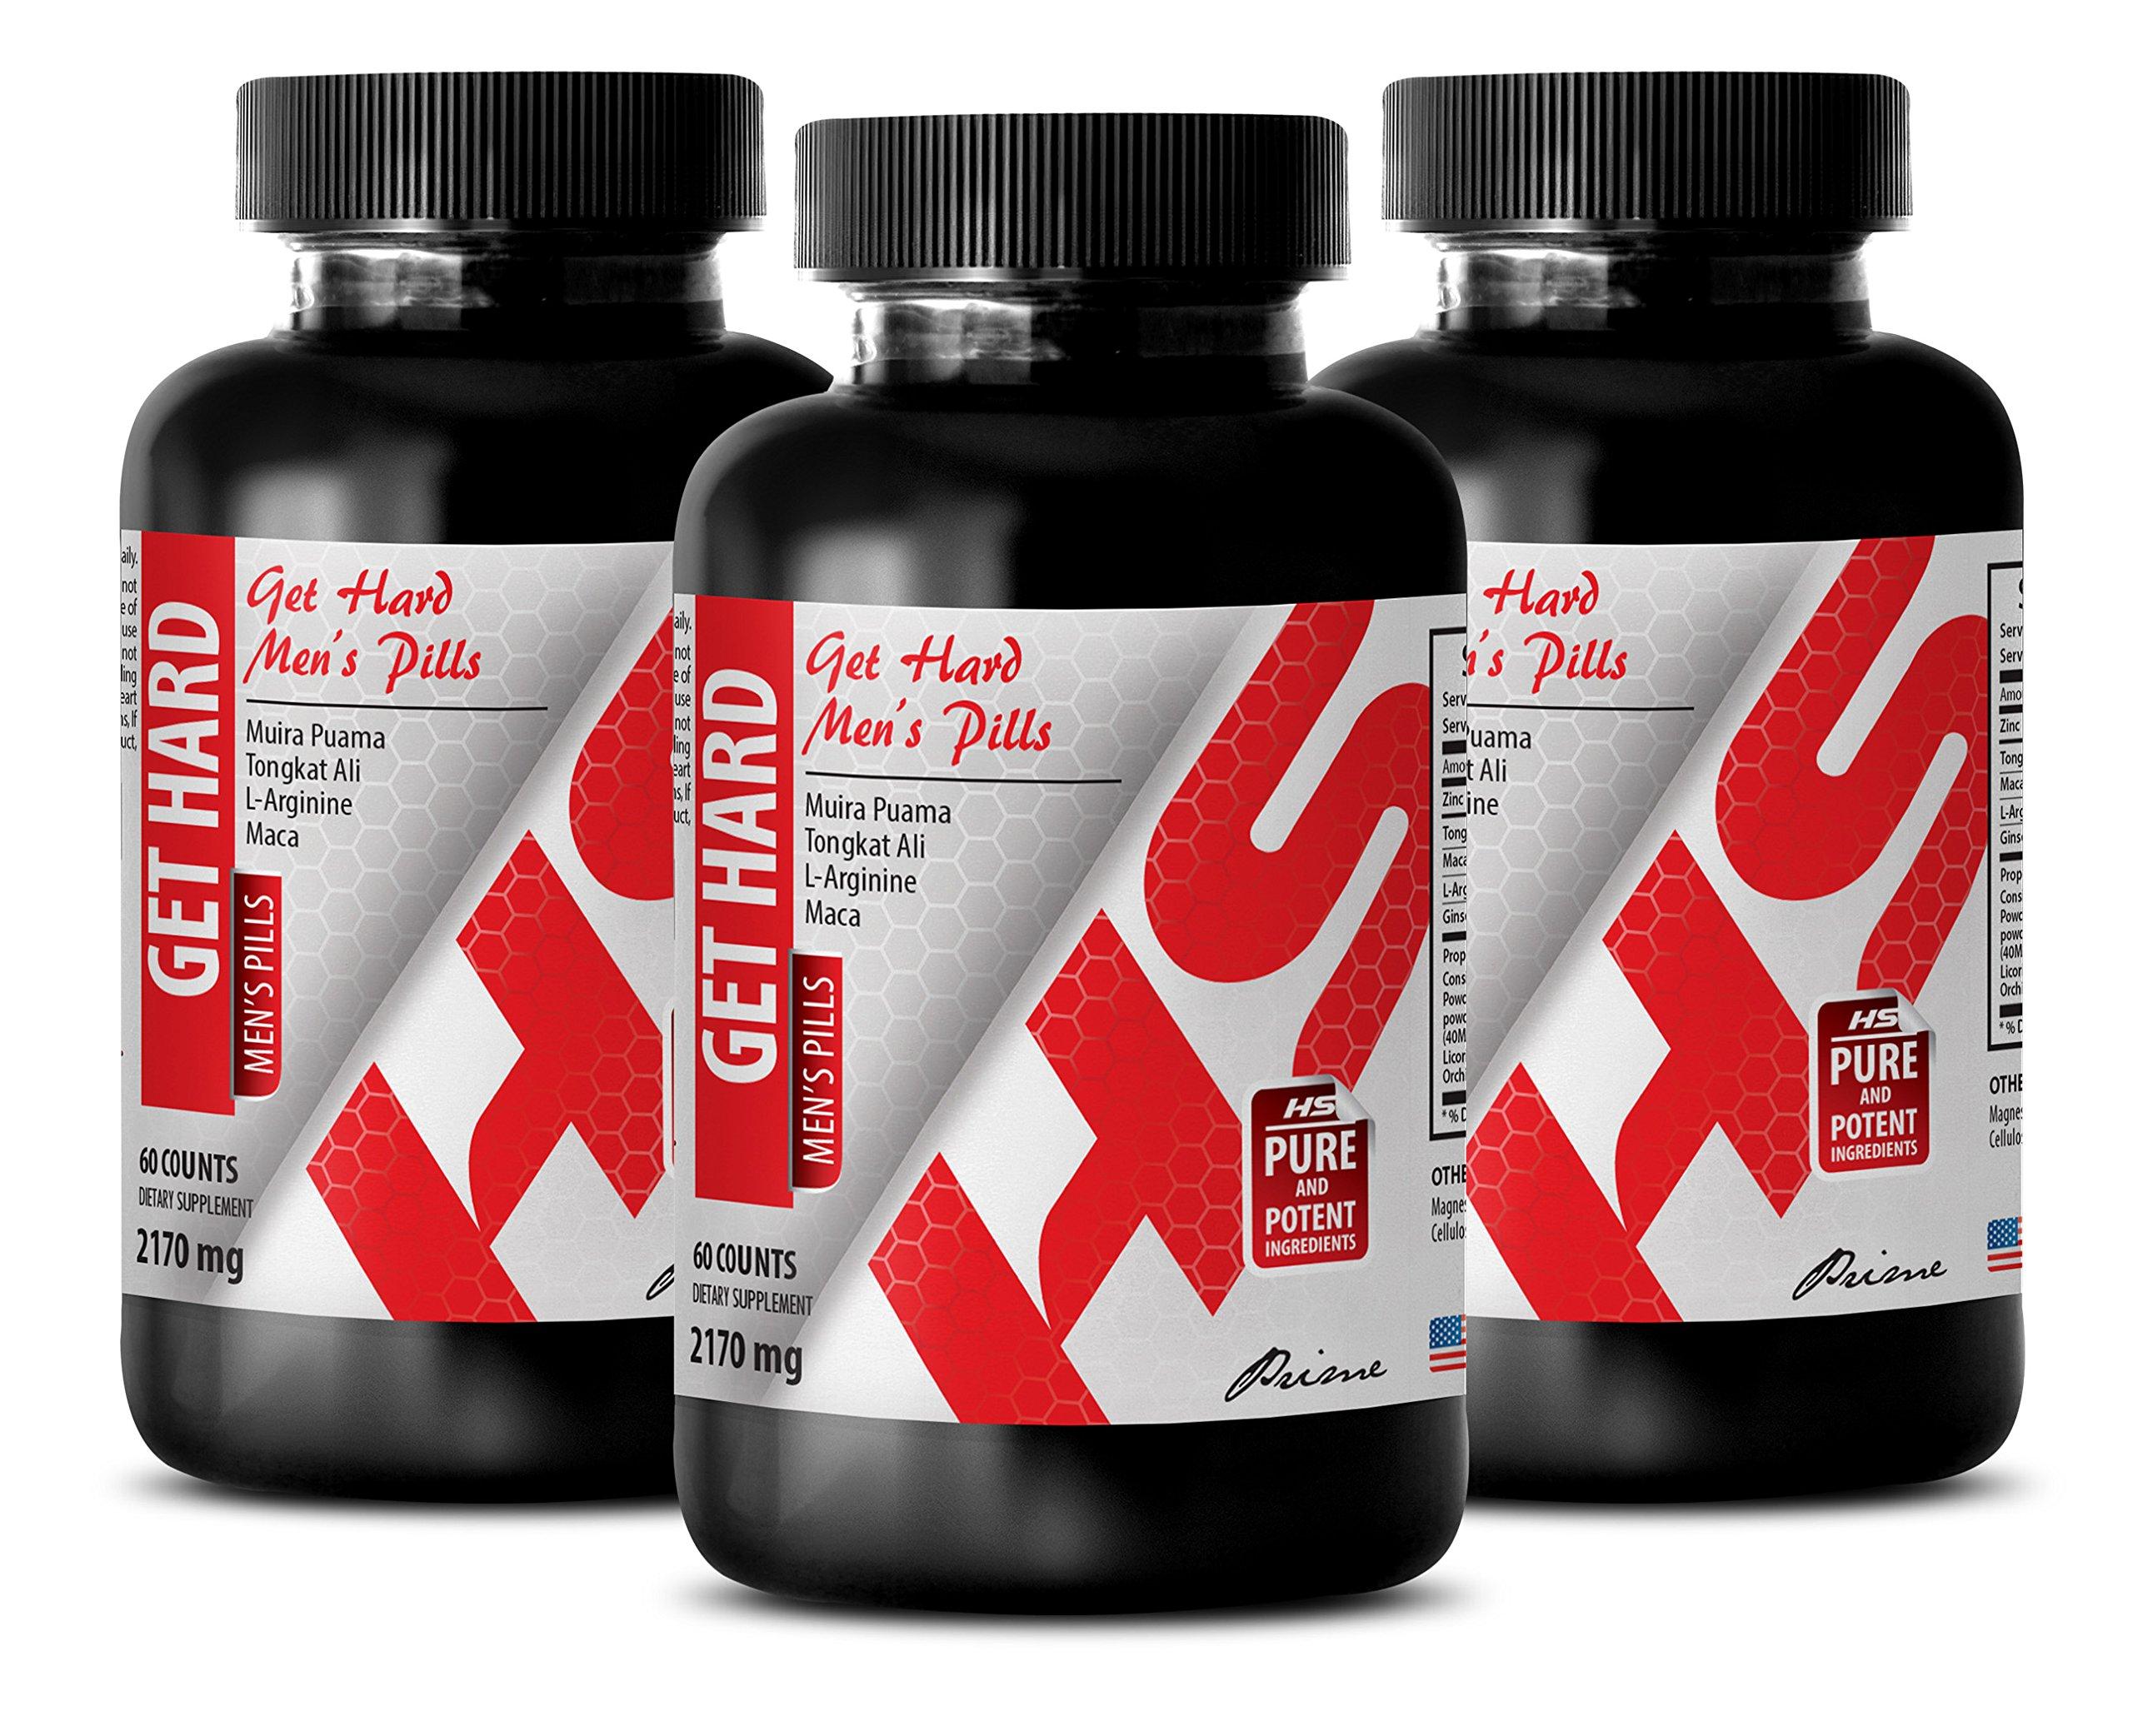 energy booster - GET HARD - MENS PILLS - l-arginine fitness - 3 Bottles (180 Capsules) by Healthy Supplements LLC (Image #1)